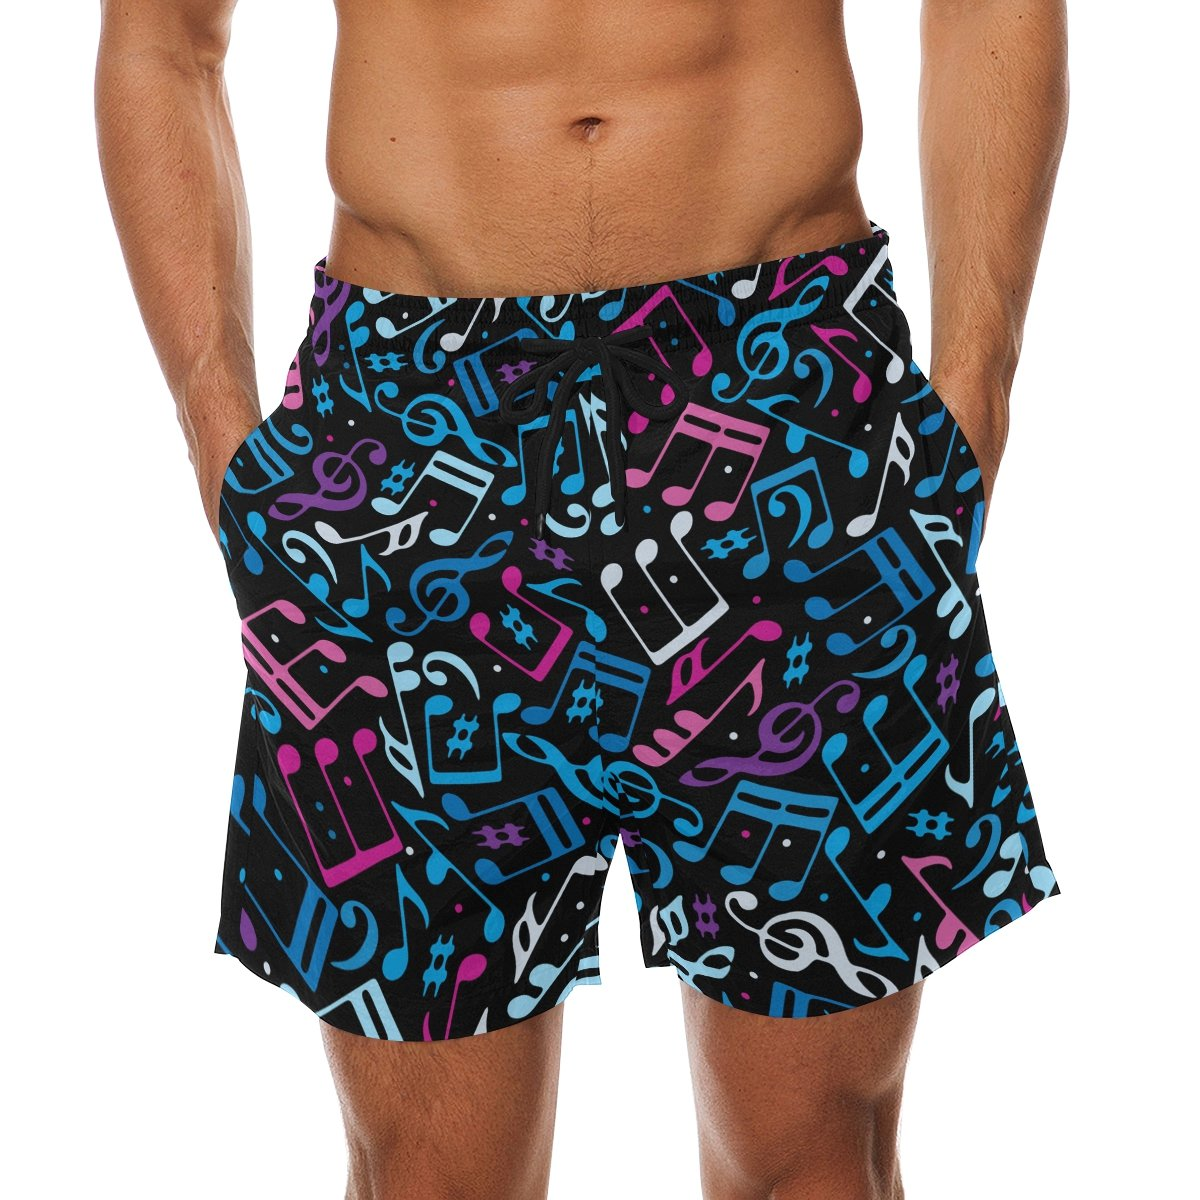 DEYYA Musical Note Summer Beach Shorts Pants Mens Swim Trunks Board Short for Men